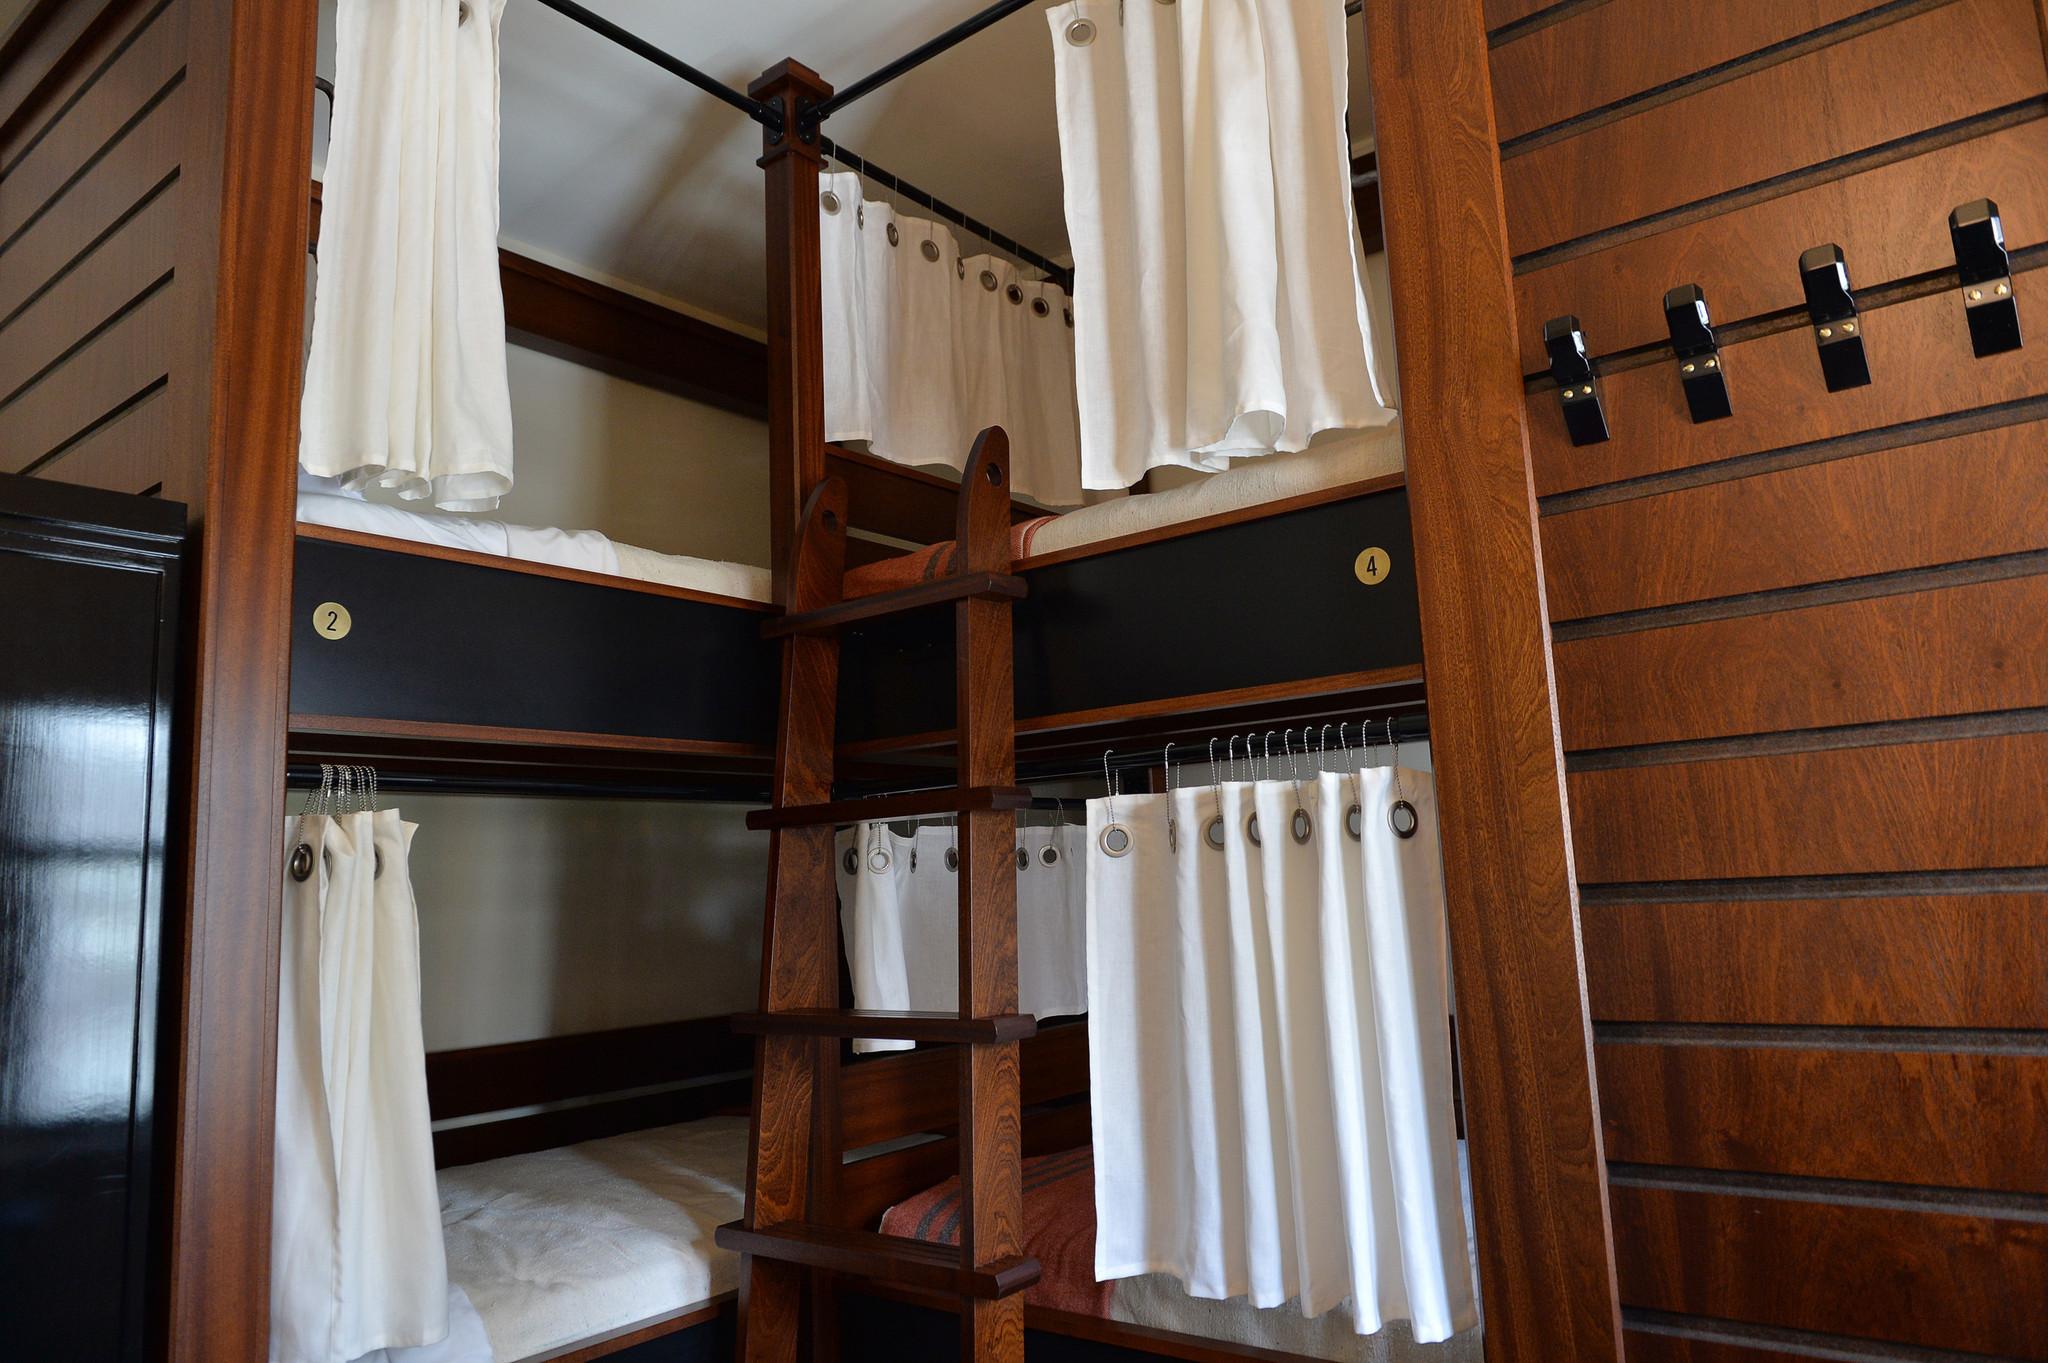 freehand chicago opens hostel style hotel chicago tribune. Black Bedroom Furniture Sets. Home Design Ideas